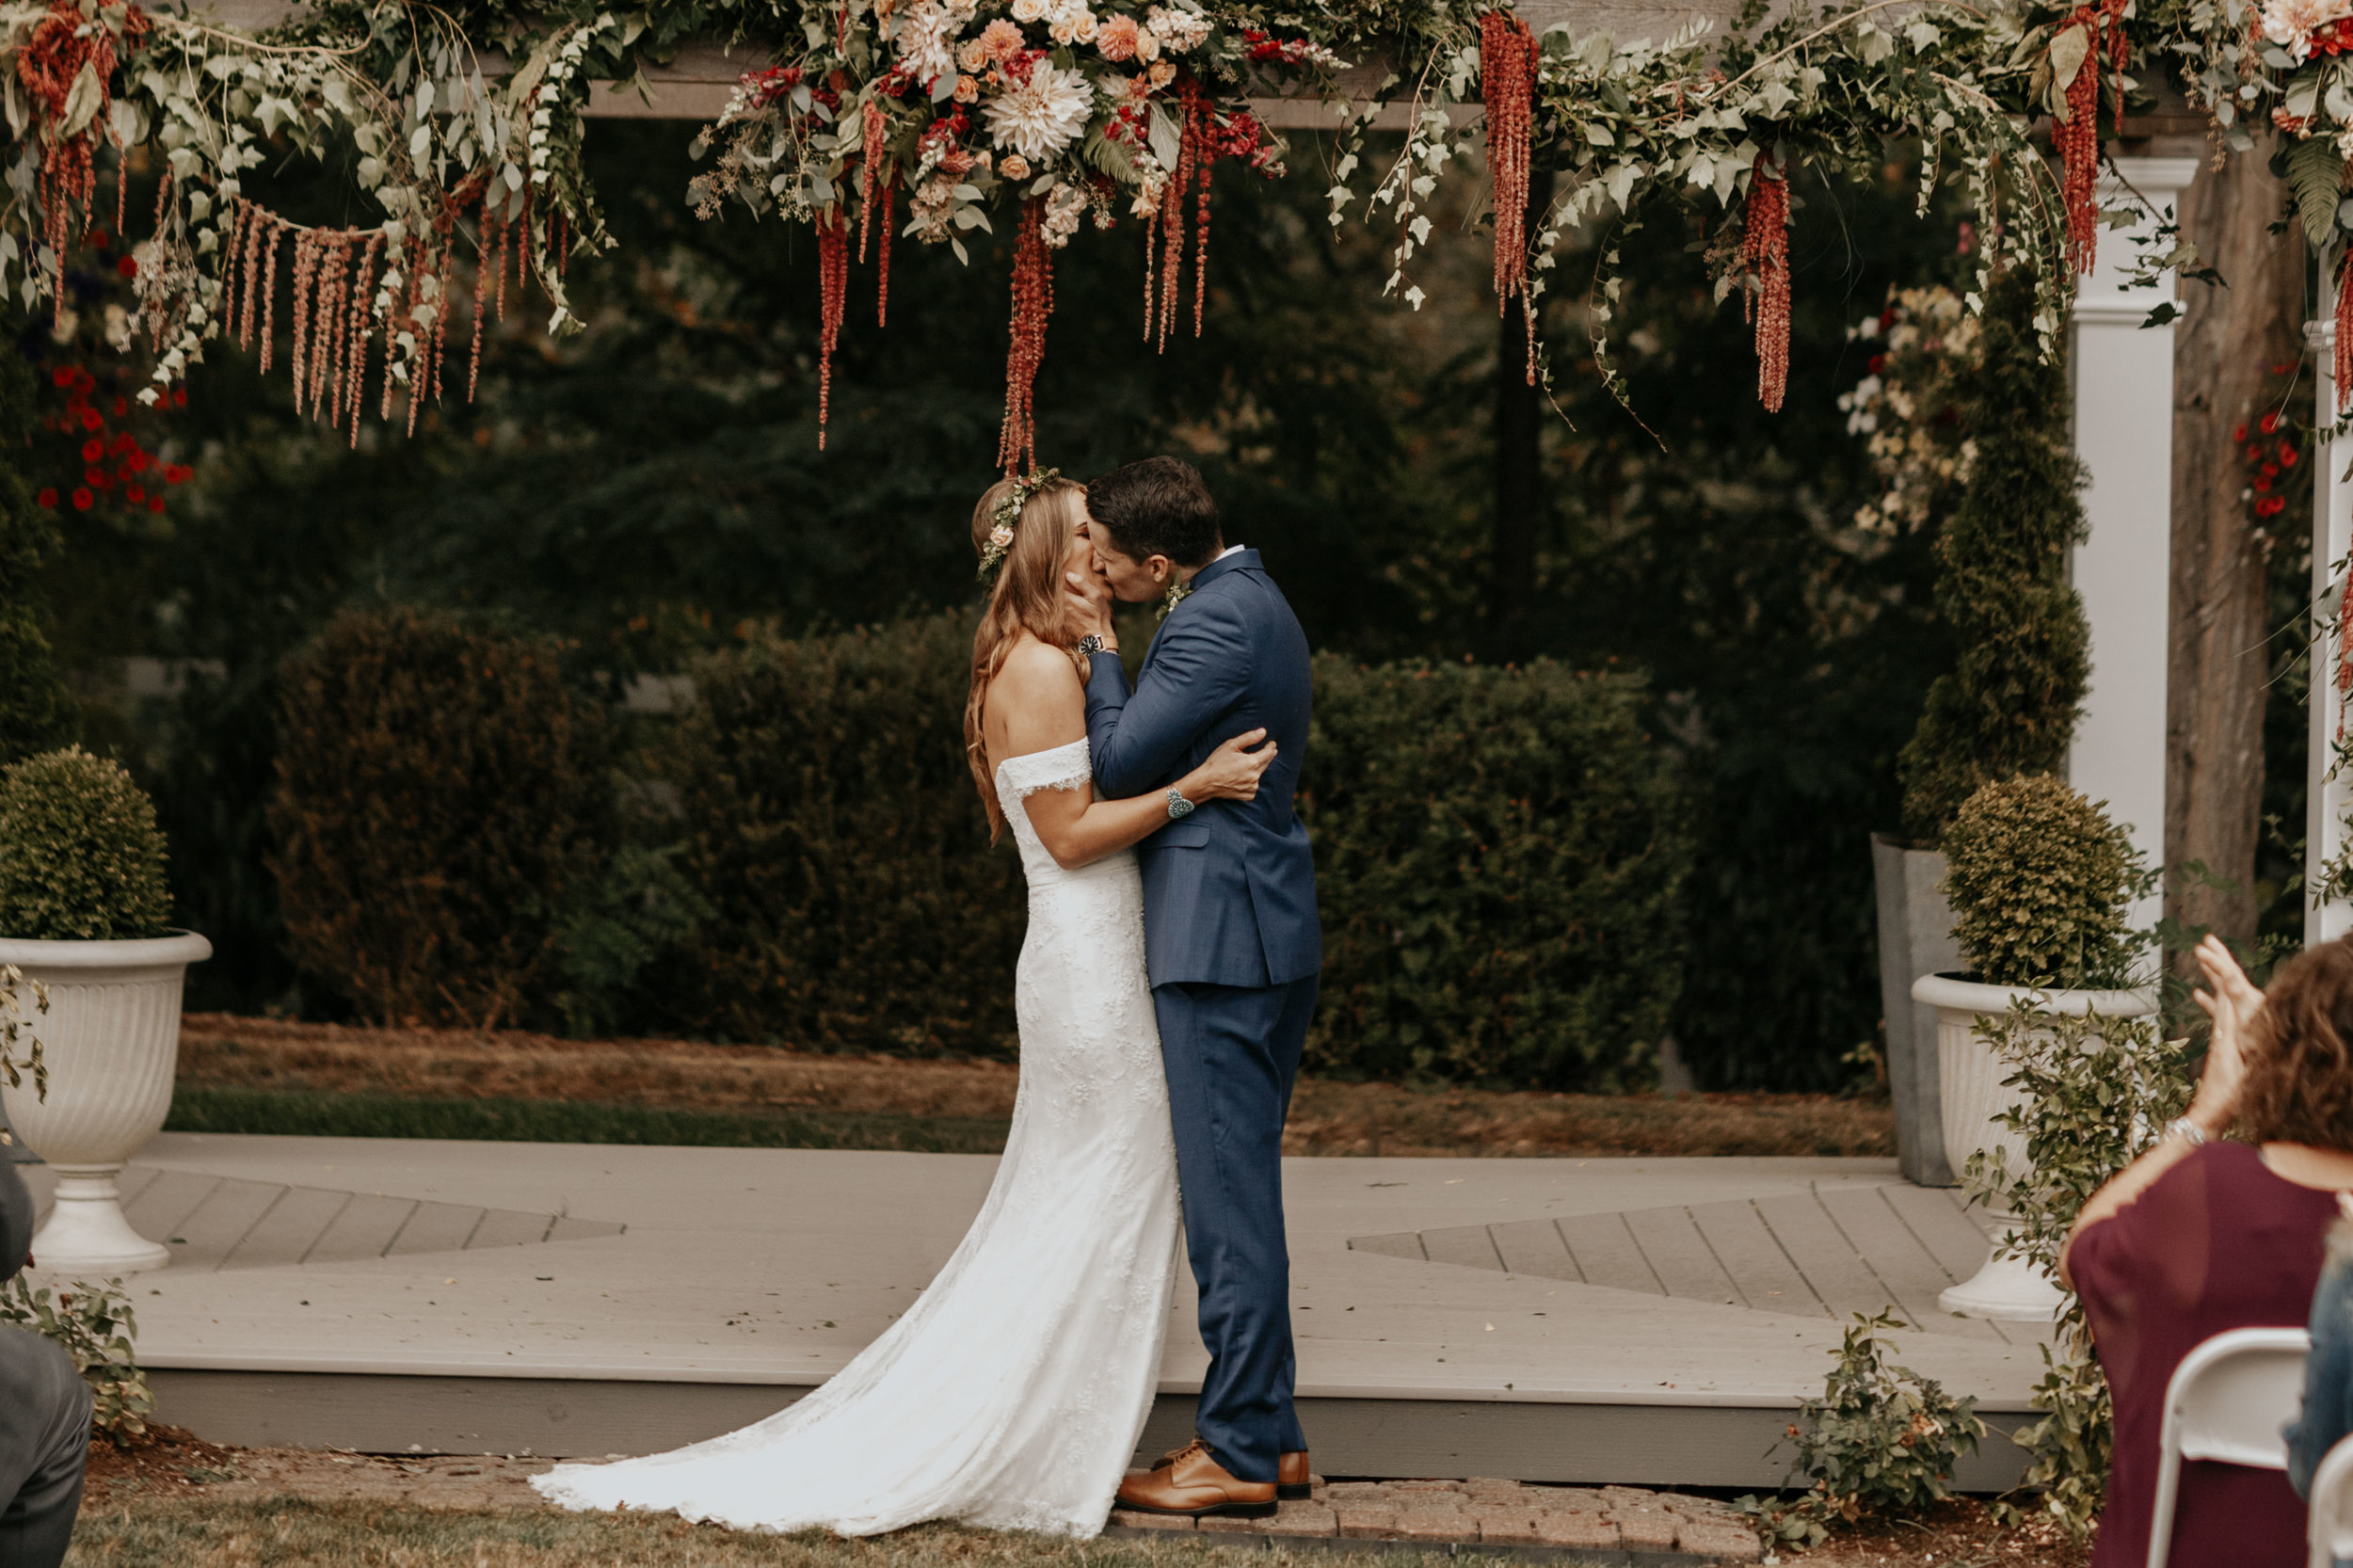 ginapaulson_jakitrevor_wedding-630.jpg